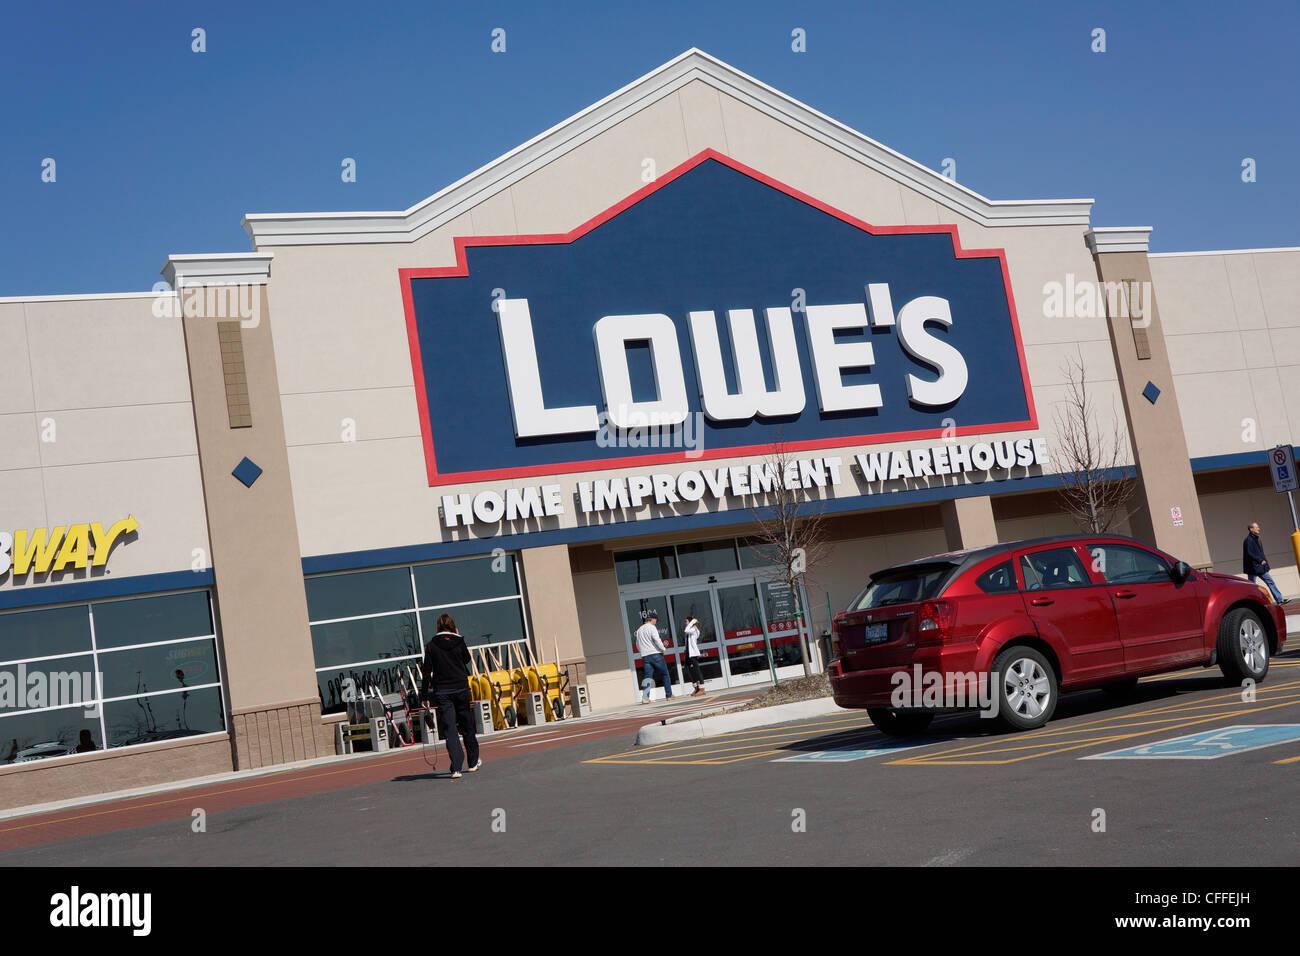 Lowe S Home Improvement lowe s home improvement store stock photo 43981353 alamy